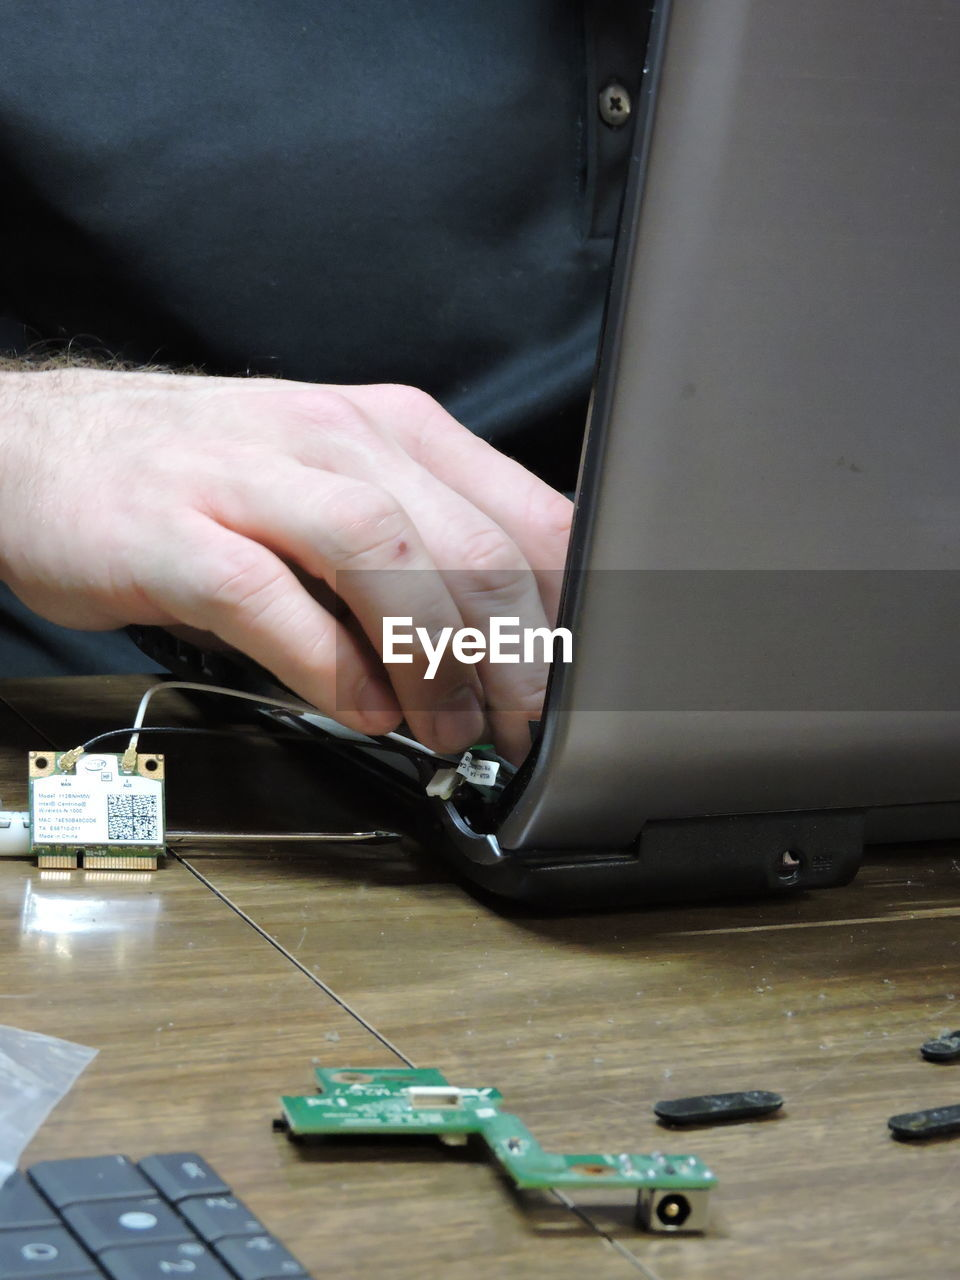 Engineer Repairing Equipment At Desk